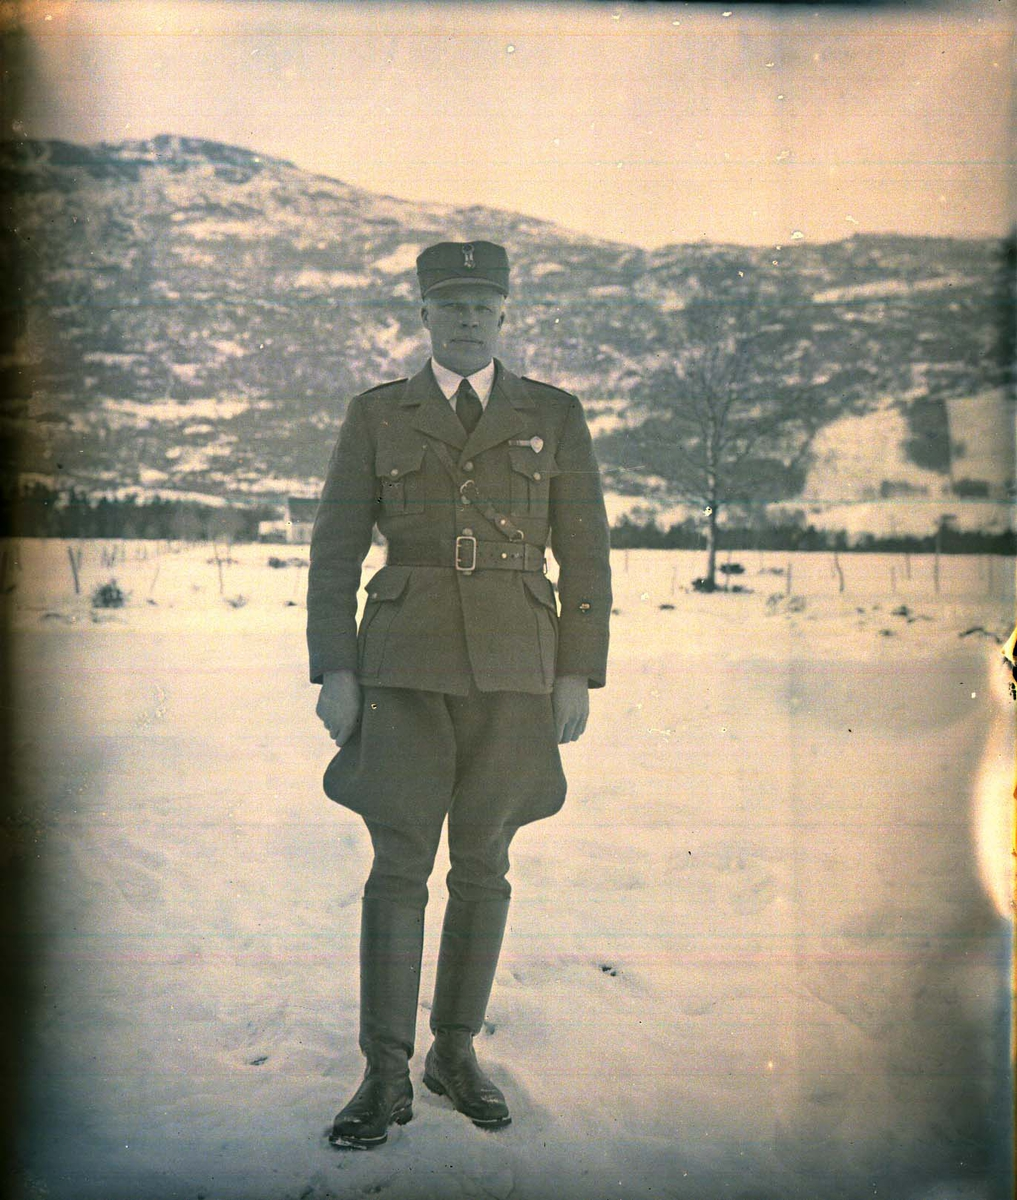 Vinterlandskap - Soldat.